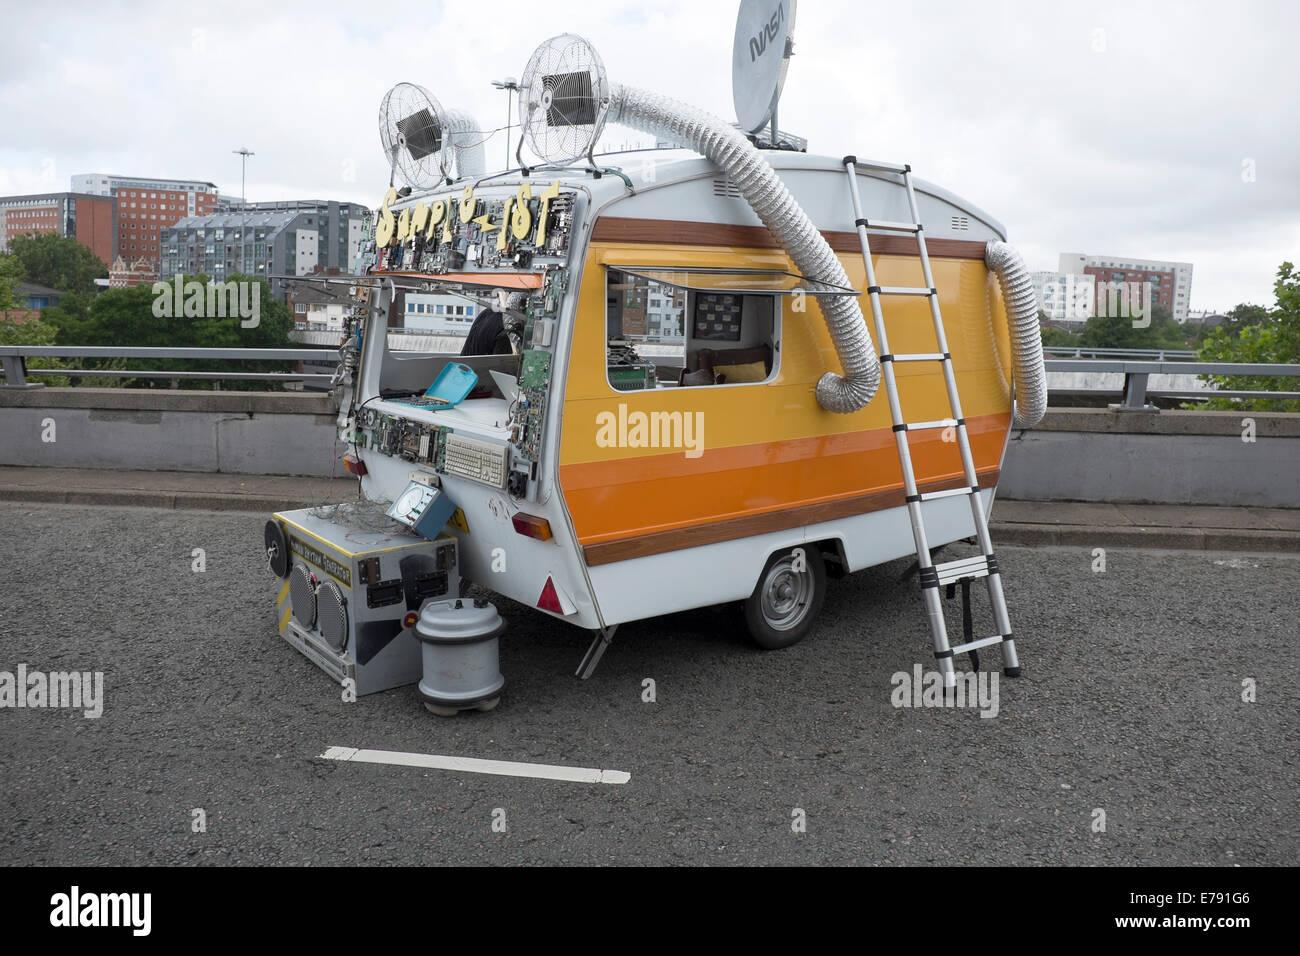 Best Caravane Decoree Contemporary - House Design - marcomilone.com